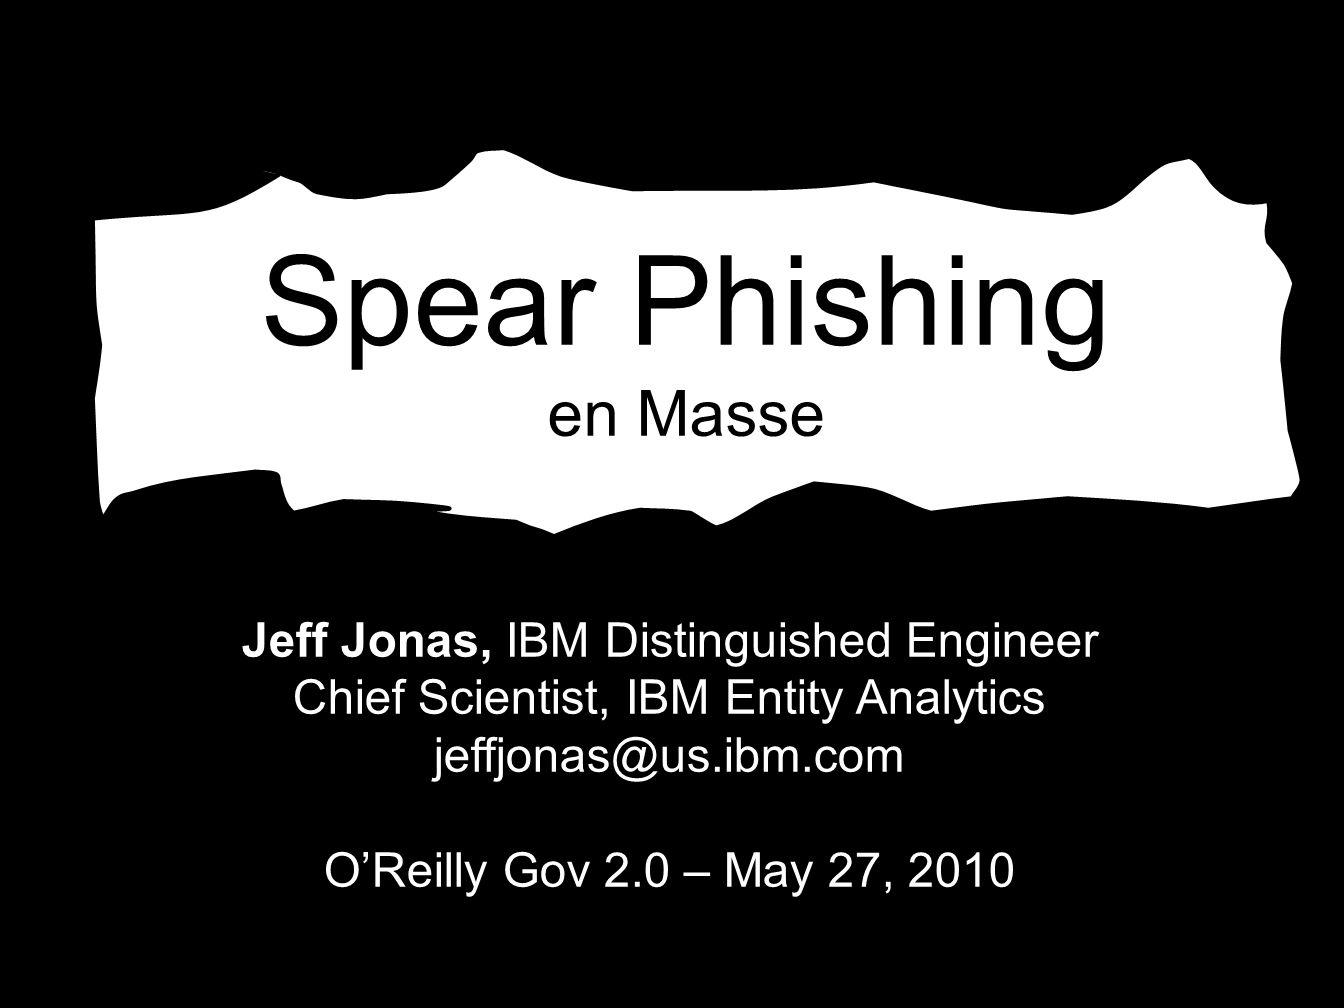 Spear Phishing en Masse Jeff Jonas, IBM Distinguished Engineer Chief Scientist, IBM Entity Analytics jeffjonas@us.ibm.com OReilly Gov 2.0 – May 27, 2010